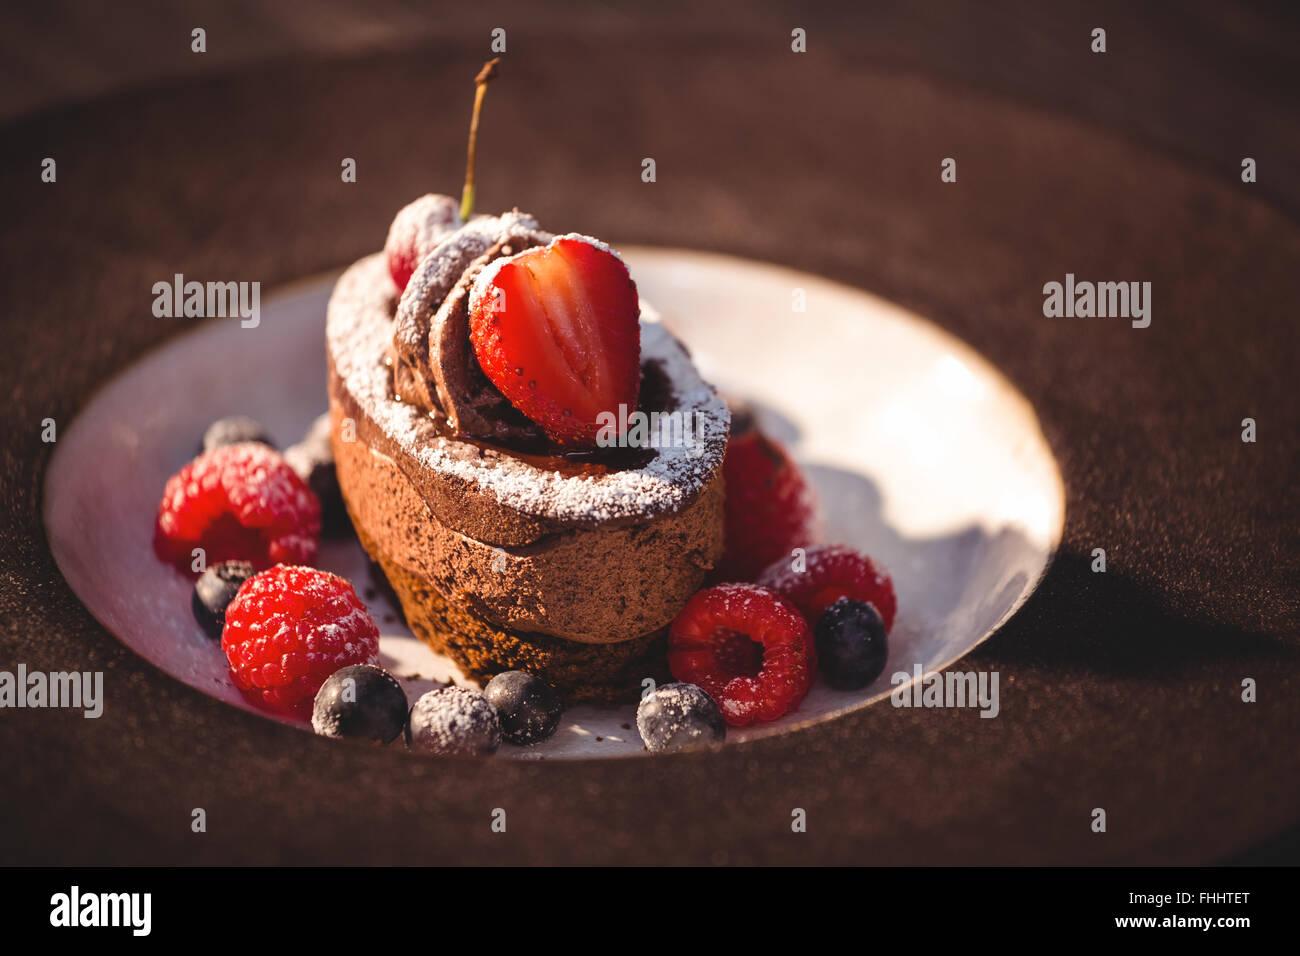 Close up of chocolate dessert Photo Stock